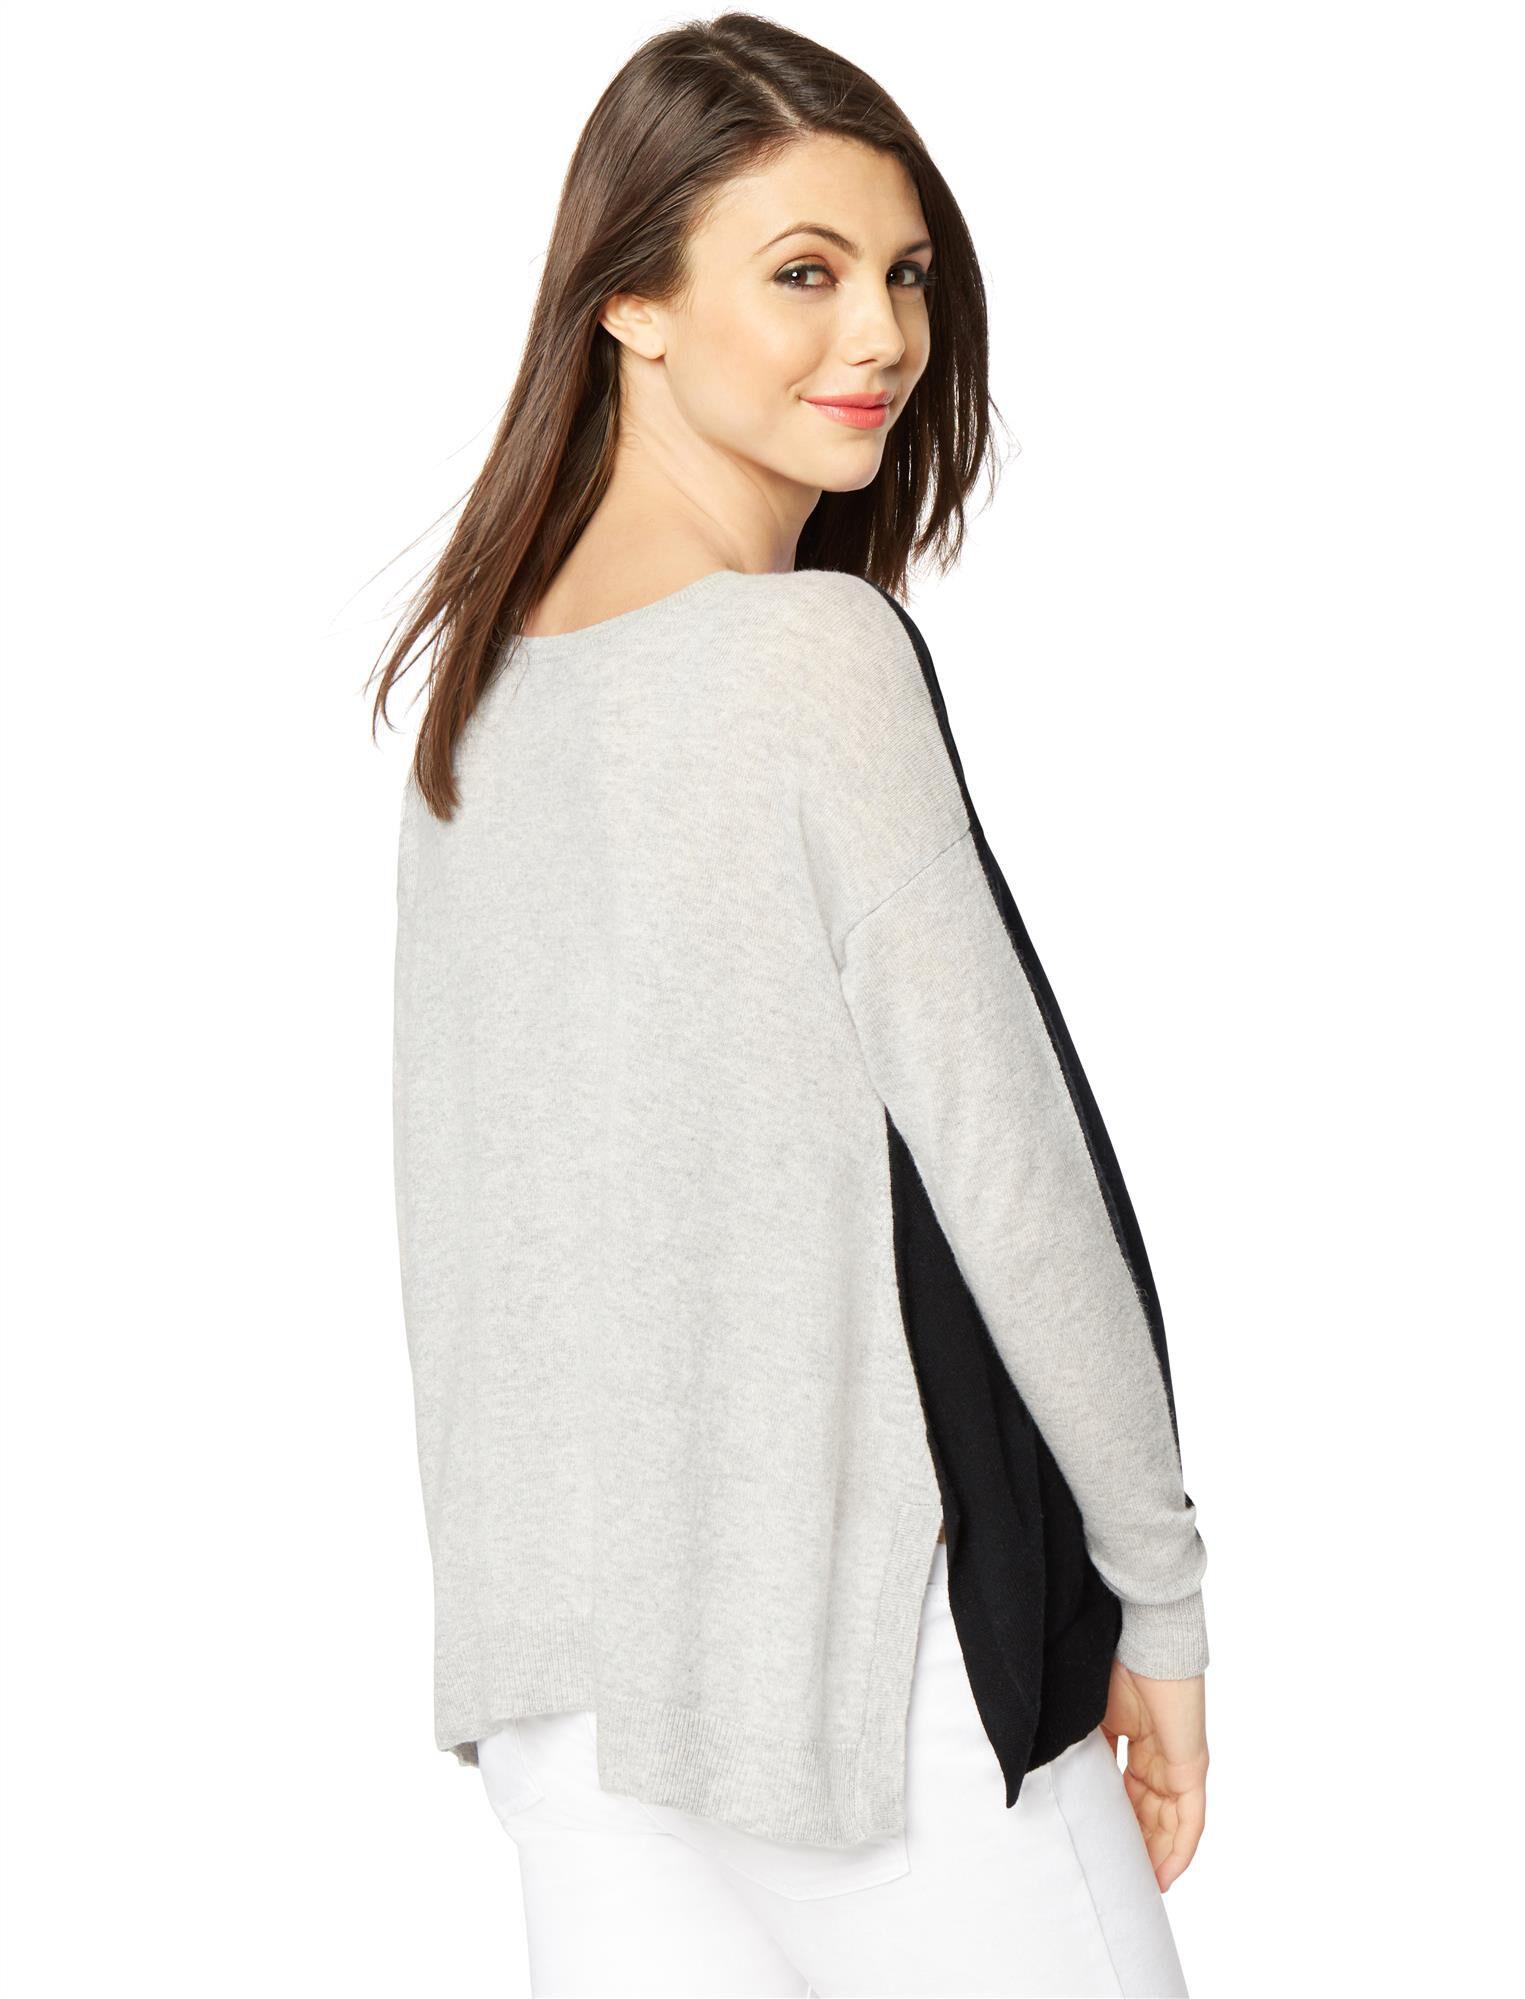 Autumn Cashmere Reversible Maternity Sweater